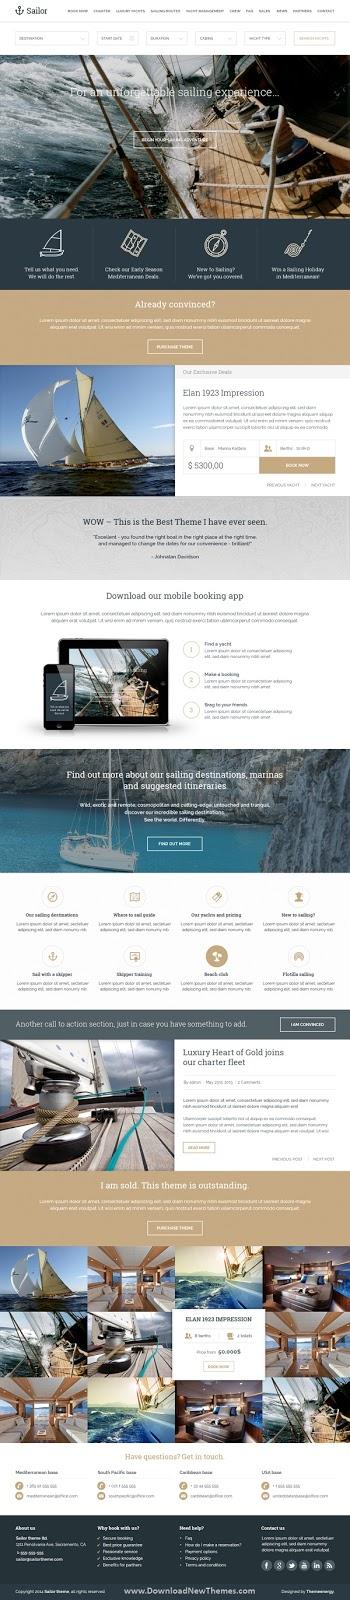 Yacht Charter Booking PSD Template